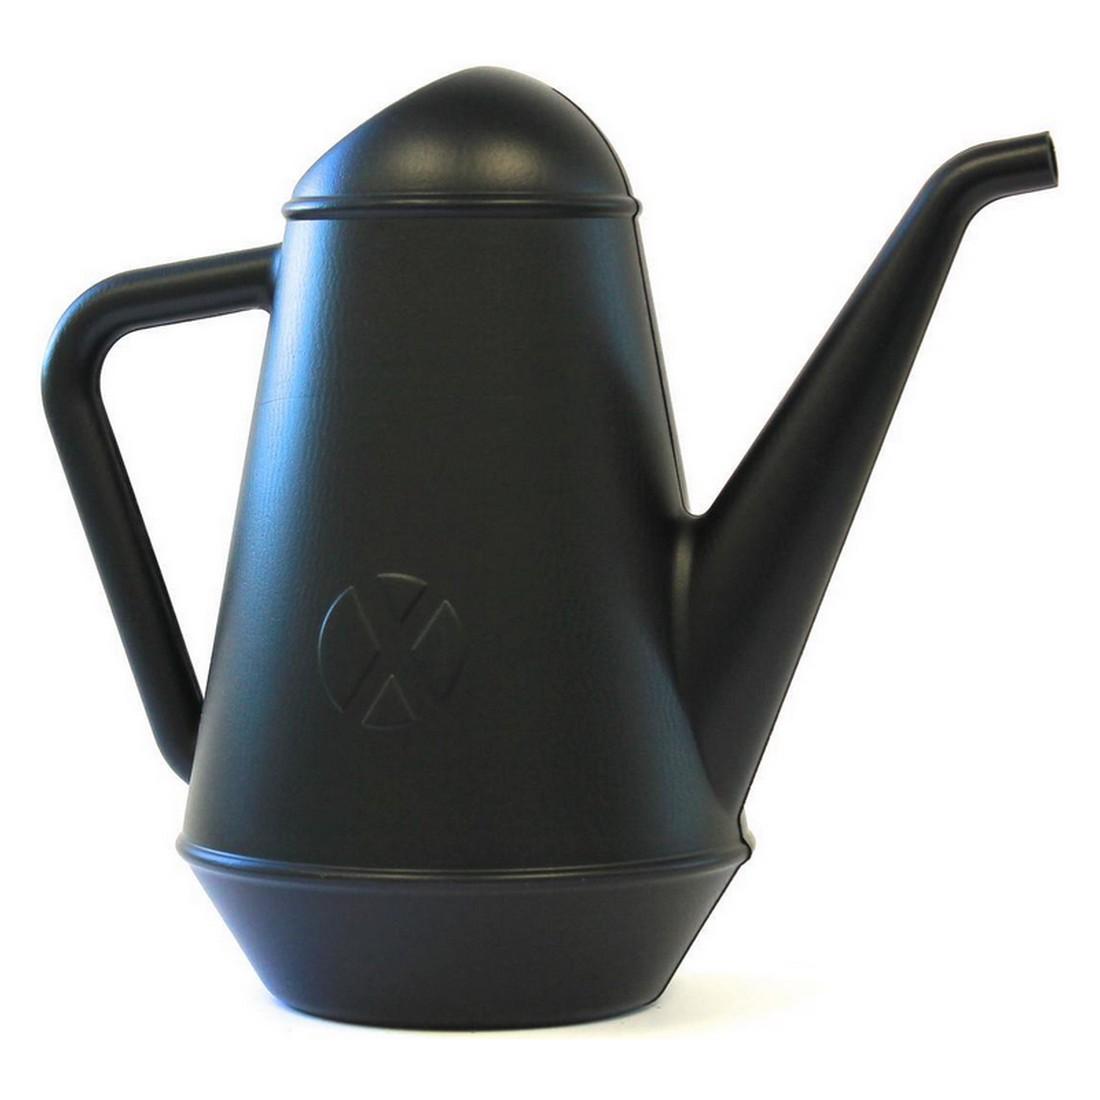 Gießkanne – Kunststoff – Schwarz – 32 x 30 x 19 cm – 6L, Xala online bestellen